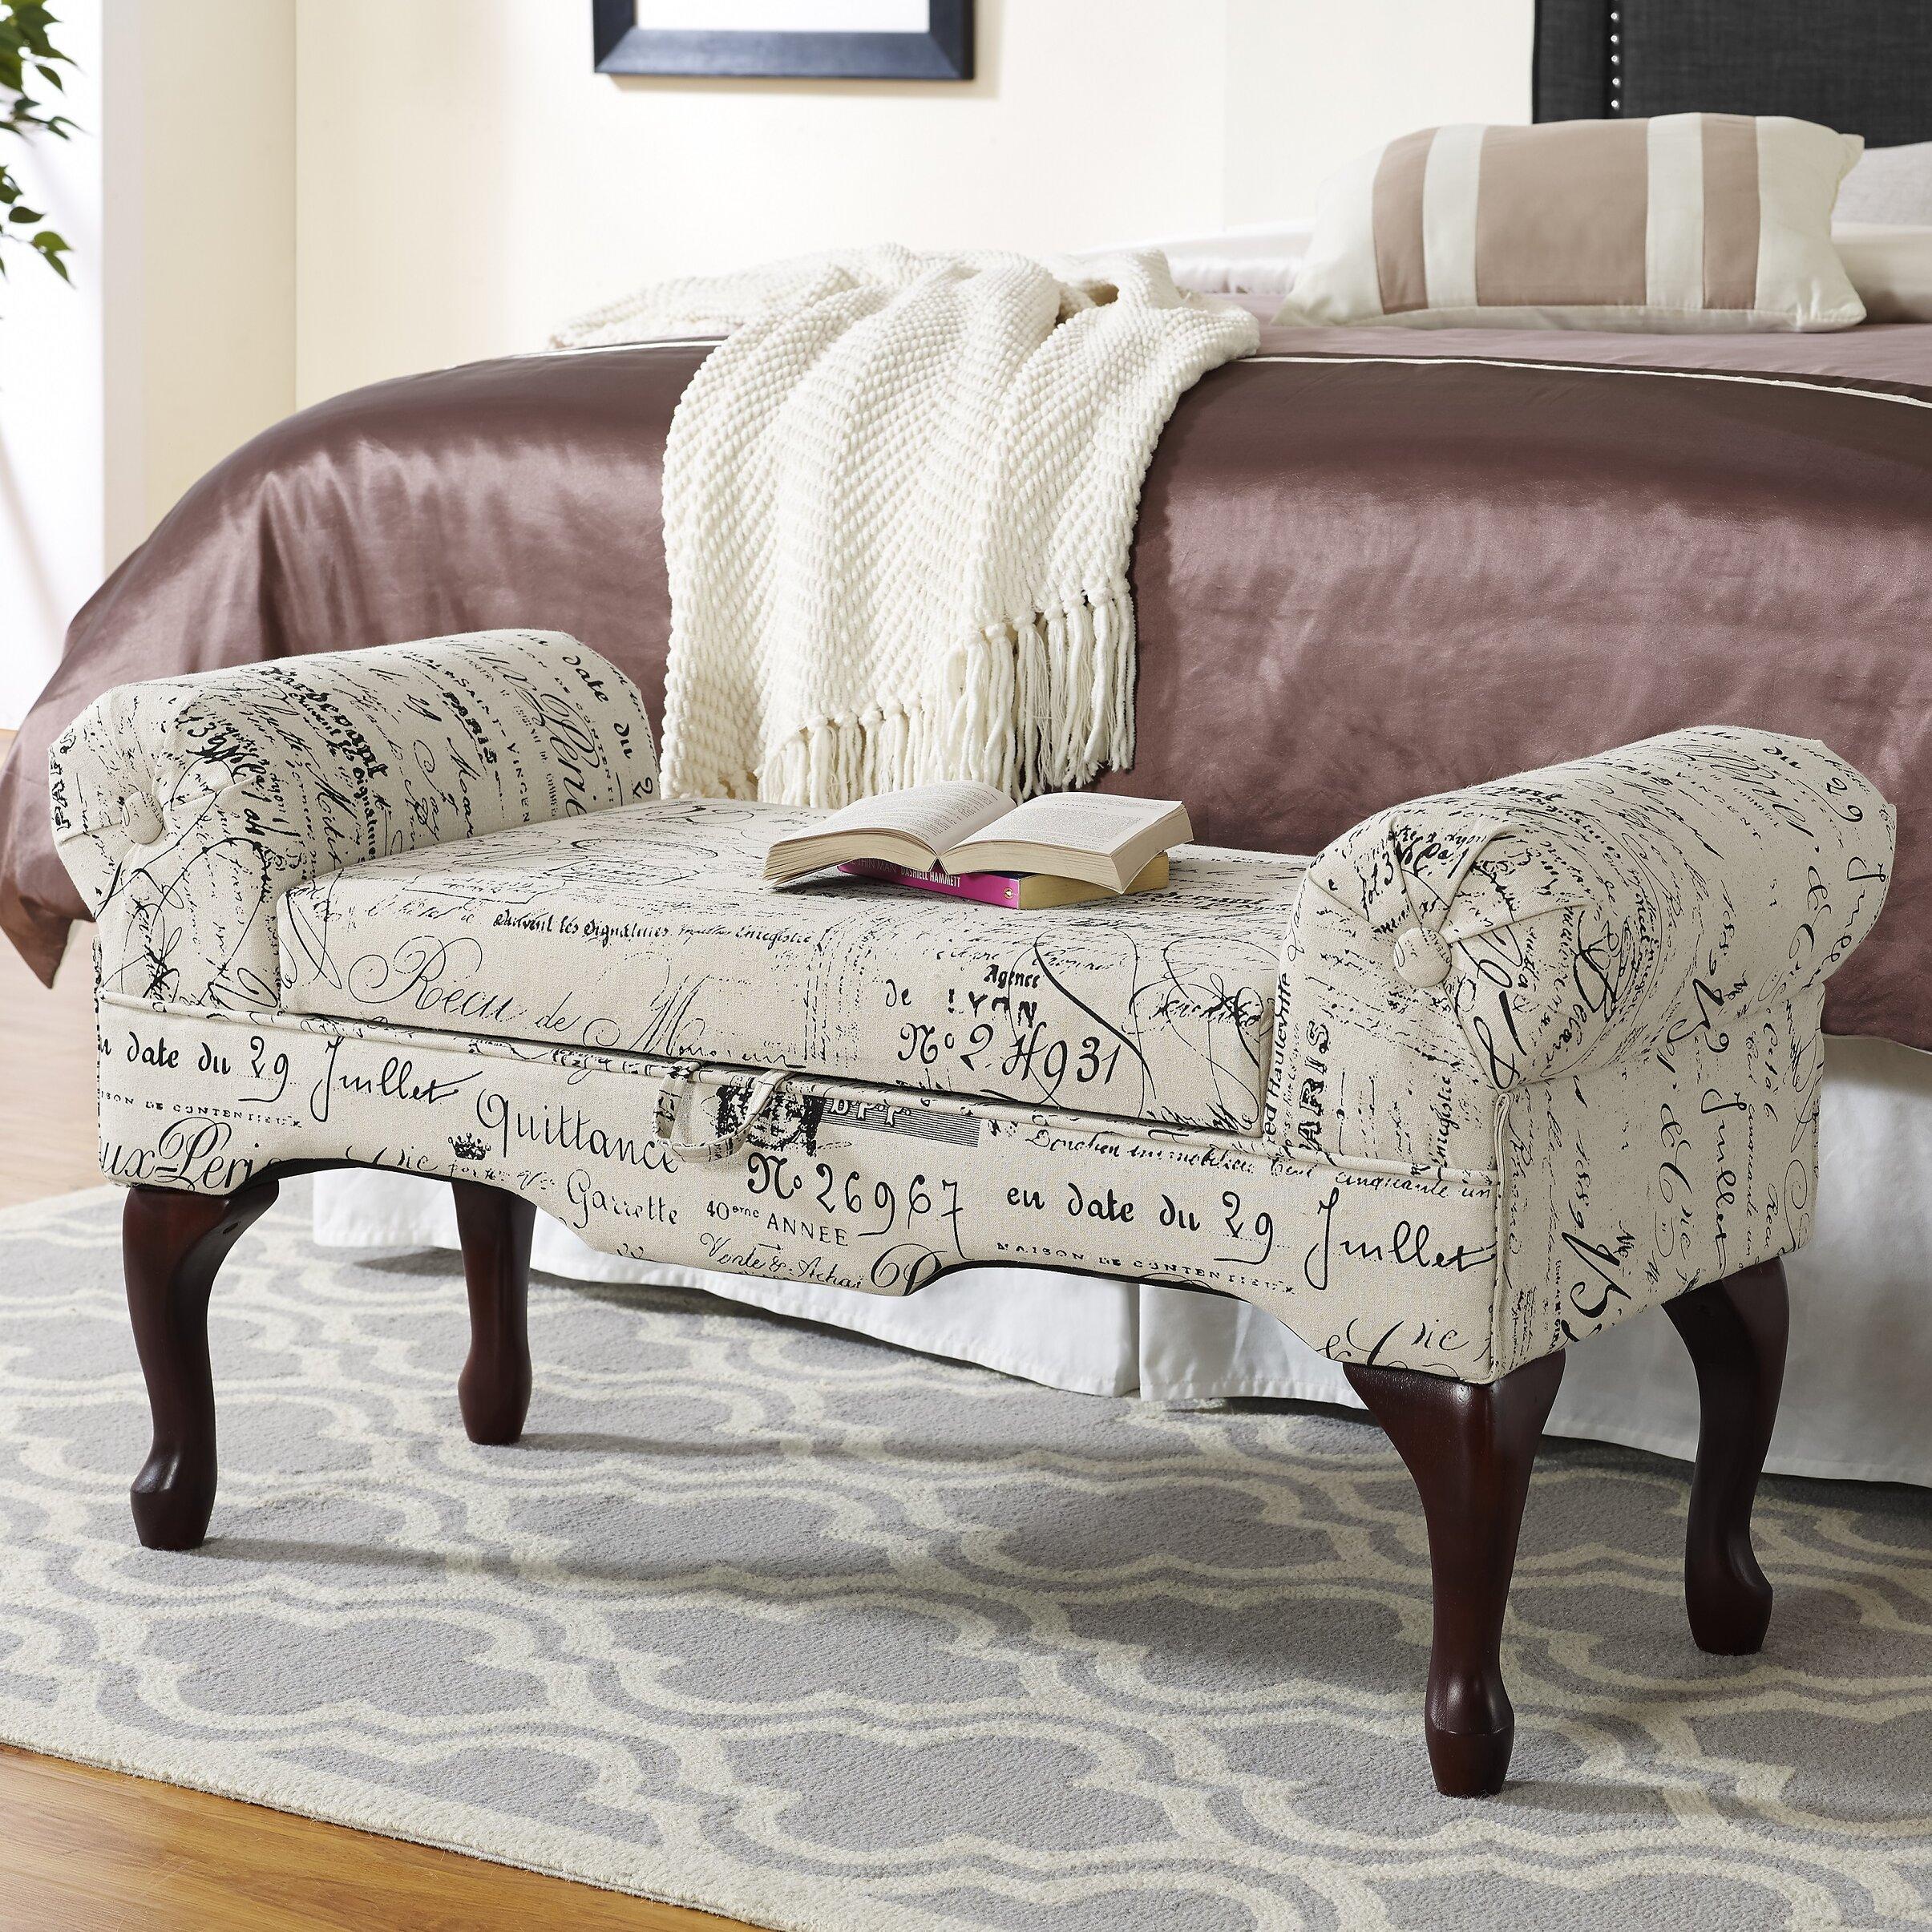 Padded Bench For Bedroom Roundhill Furniture Lilion Upholstered Storage Bedroom Bench